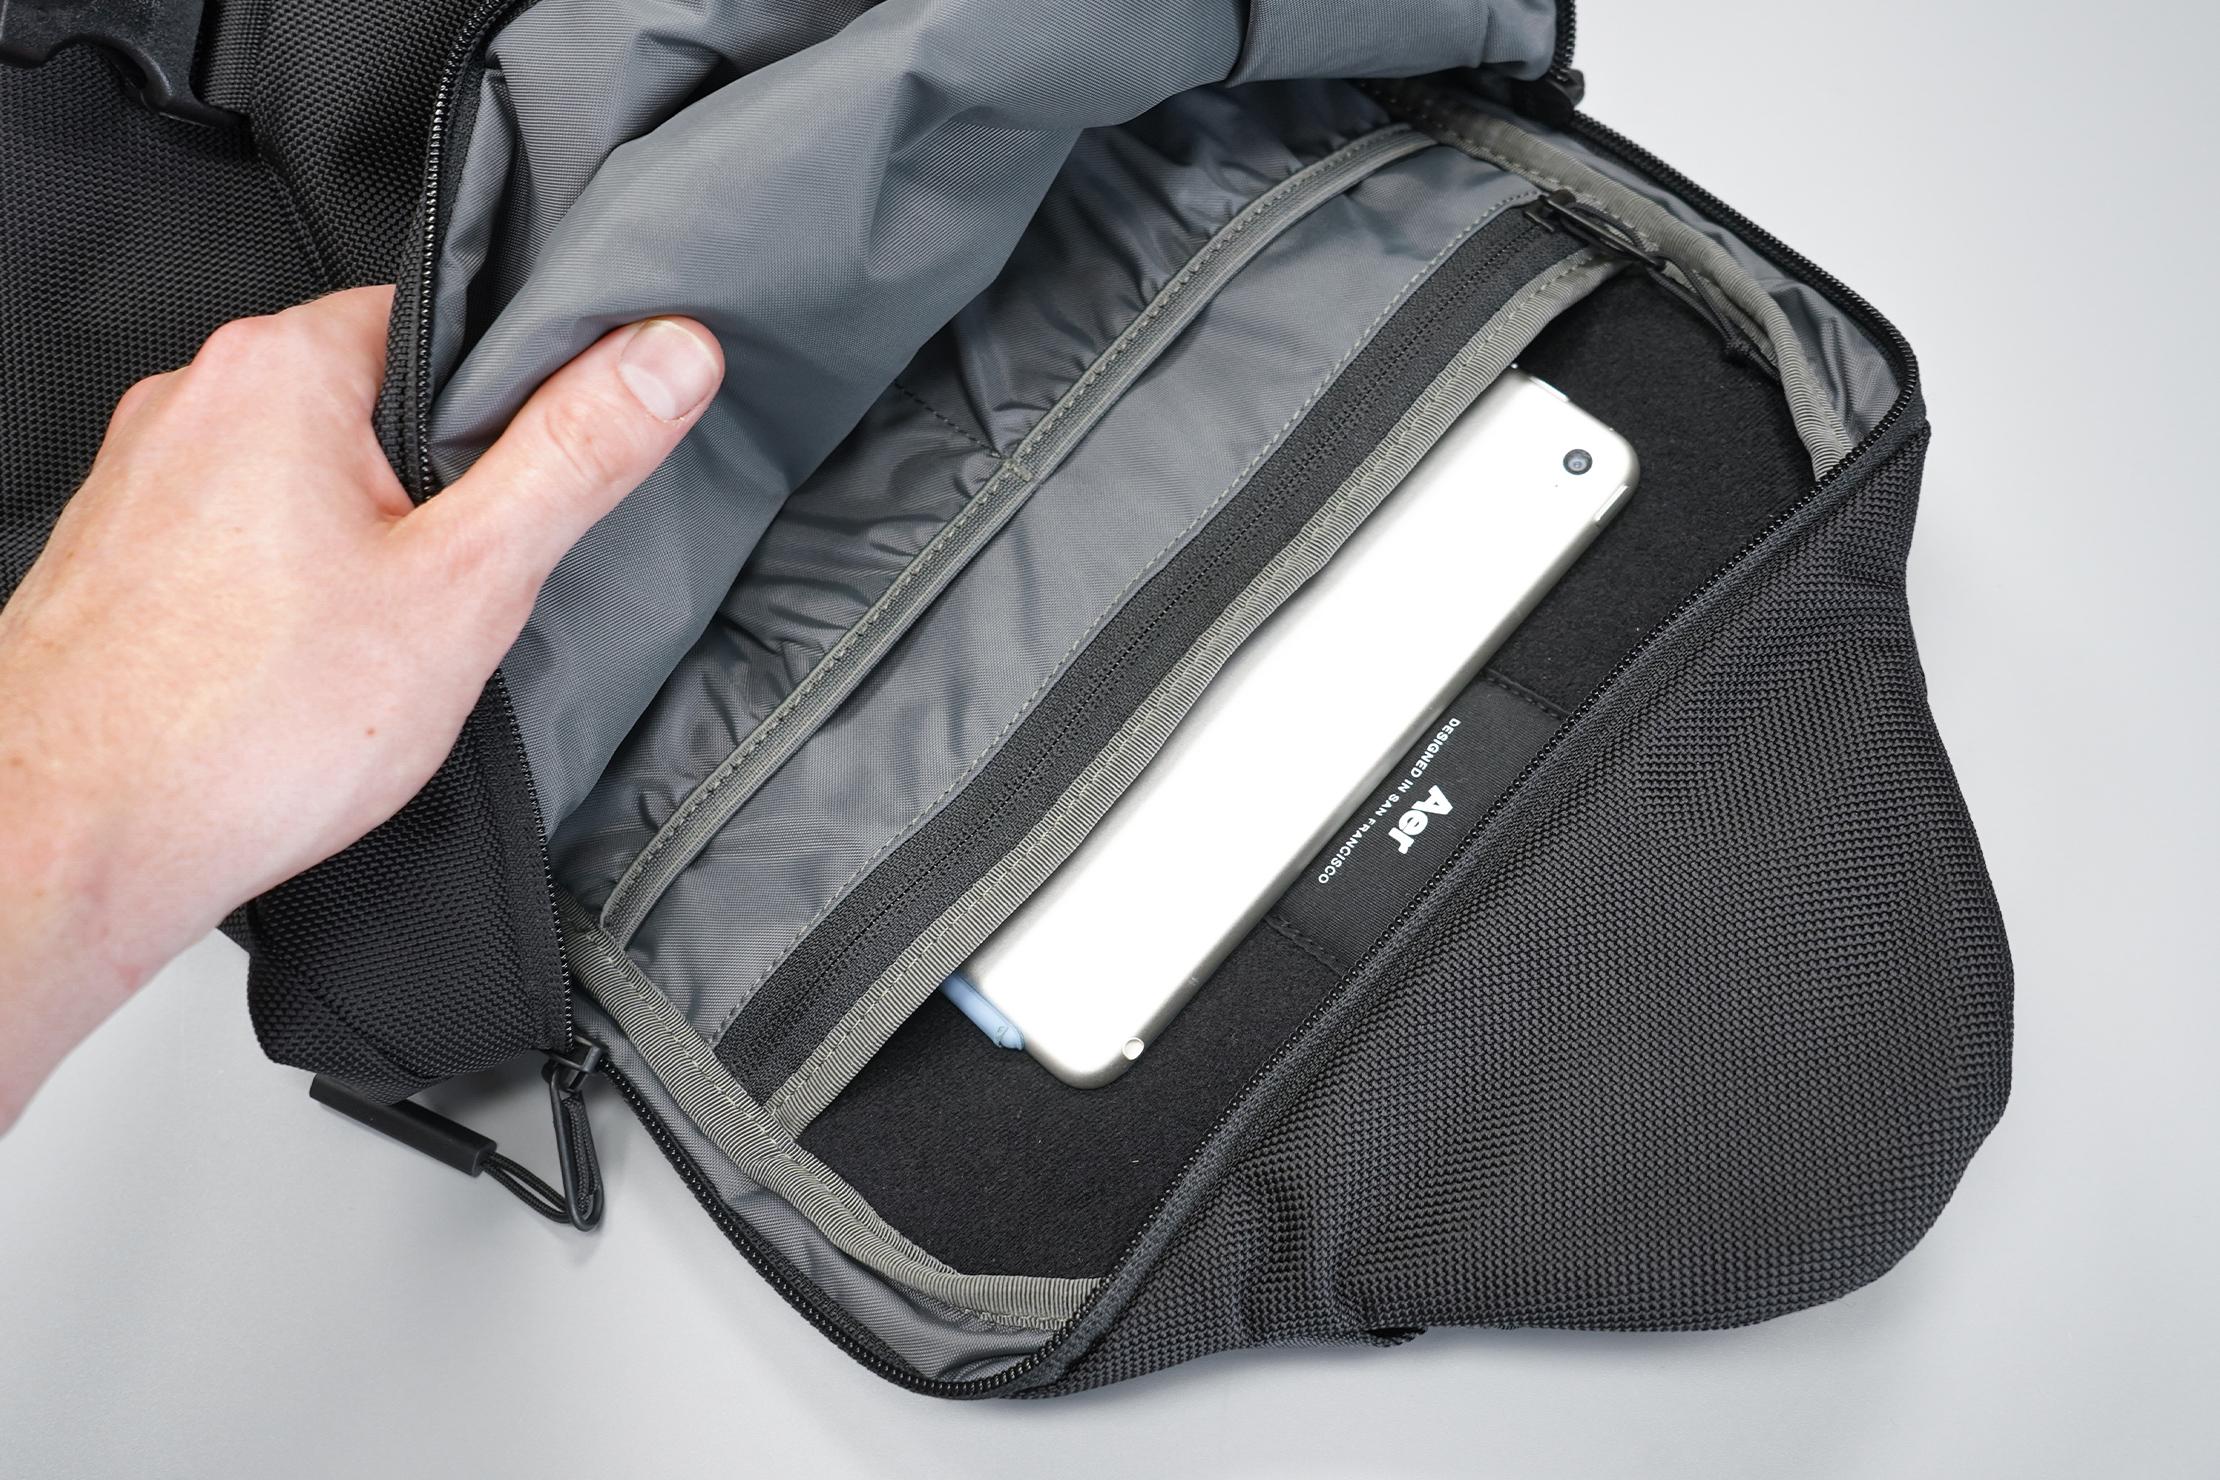 Aer Sling Bag 3 tech sleeve